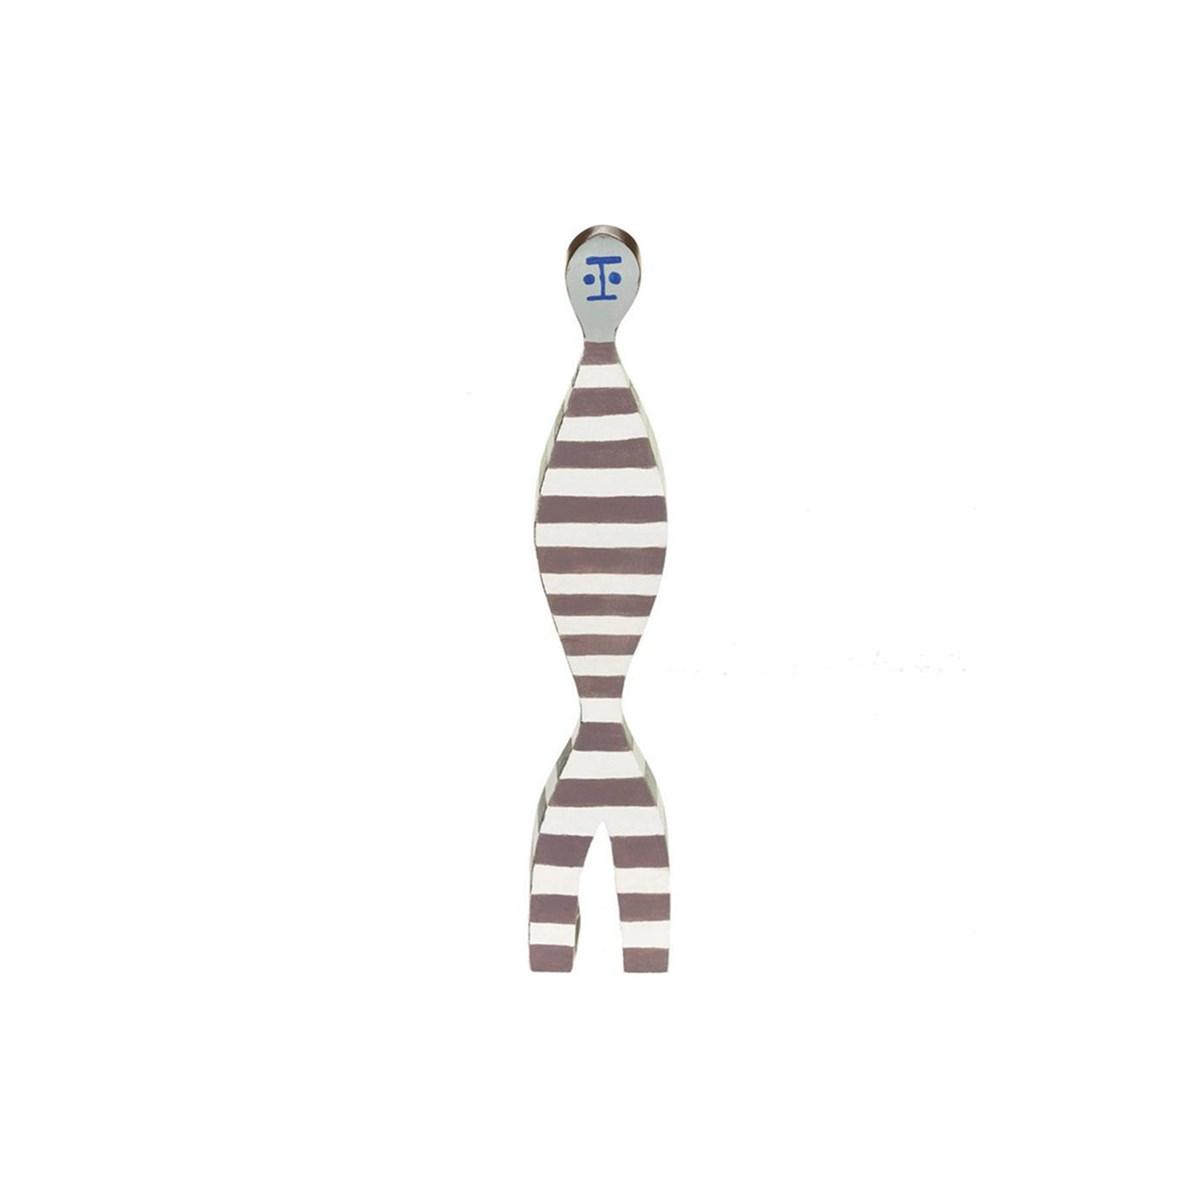 Vitra-Alexander-Girard-Wooden-Doll-No.16-Matisse-1